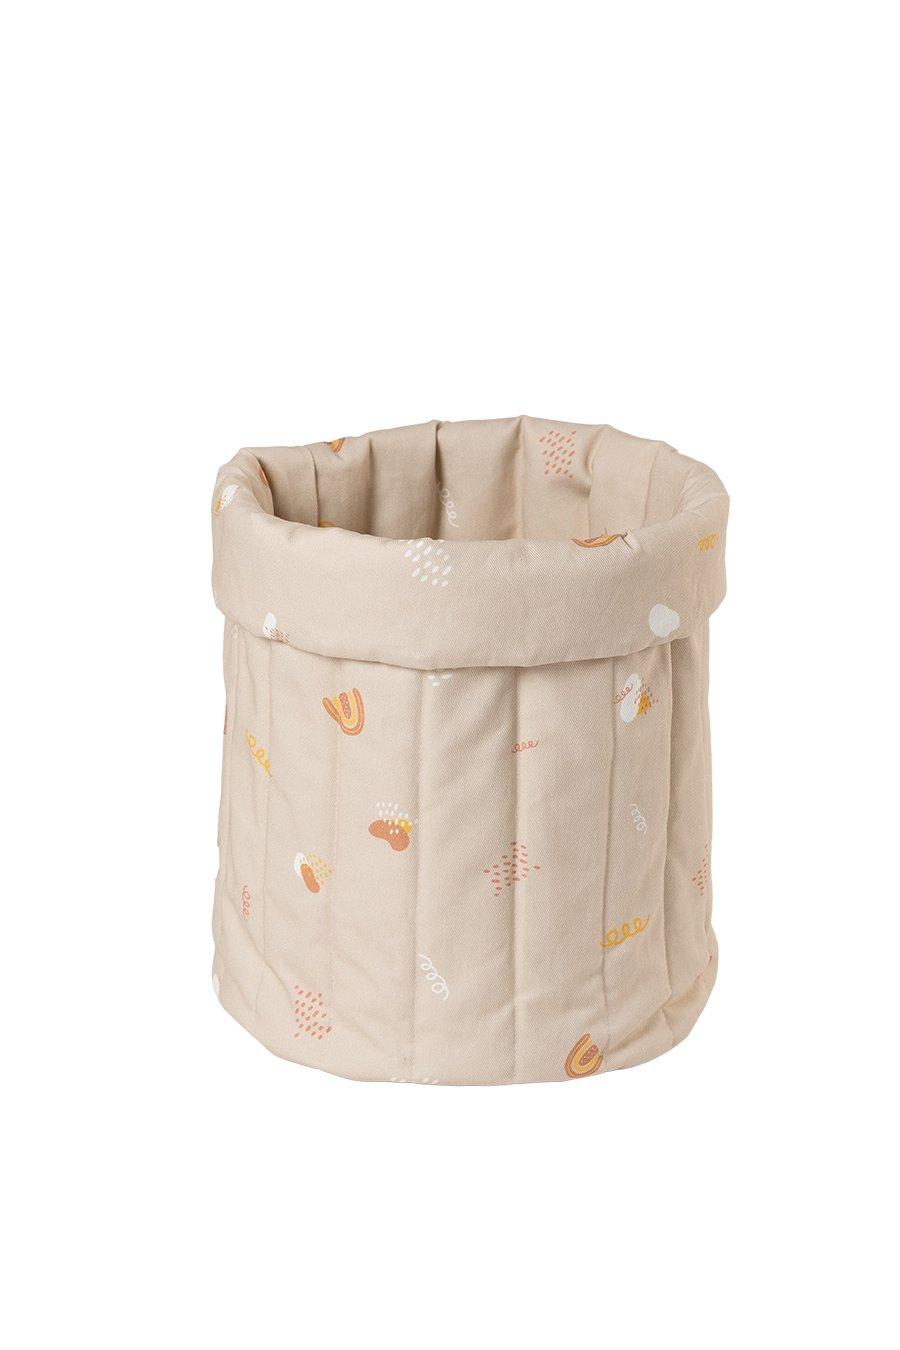 wigiwama - AMBER TOY BAG SMALL